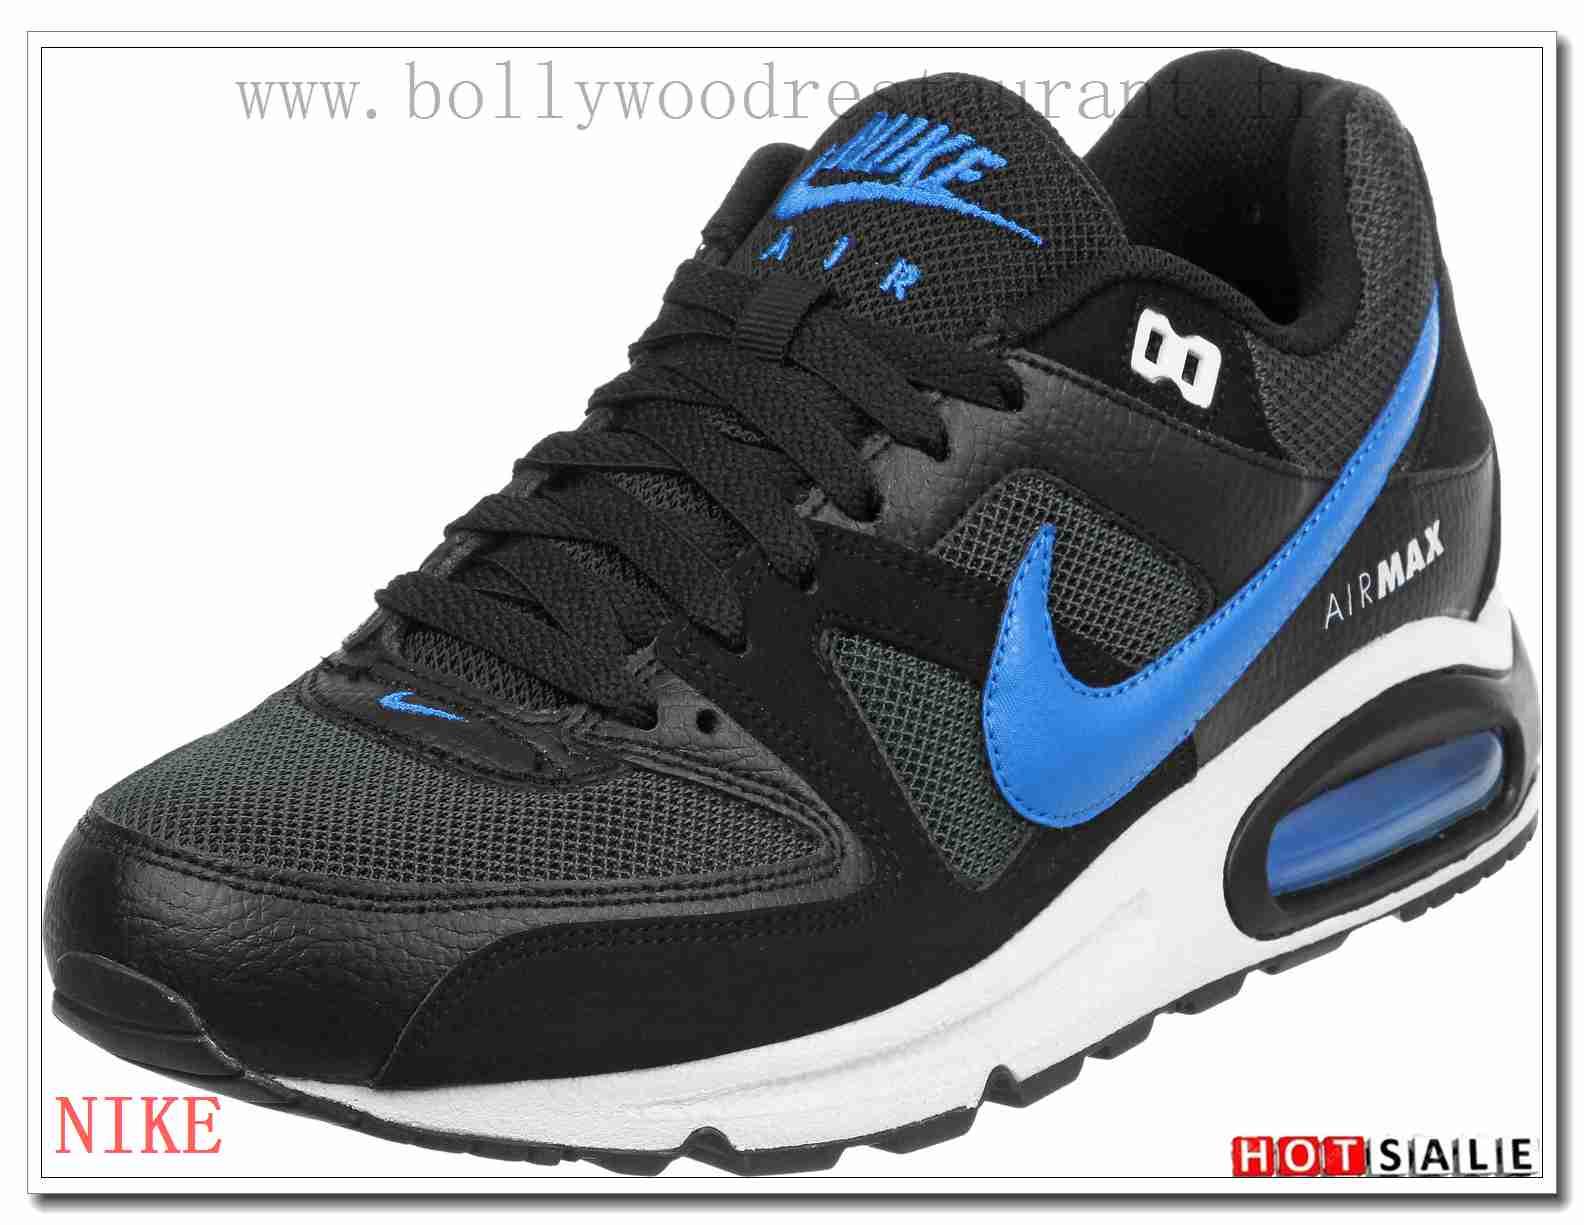 official photos 08db7 e059a CG9633 tricoté 2018 Nouveau style Nike Air Max Command - Homme Chaussures - Promotions  Vente - H.K.Y. 428 - Taille   40~44